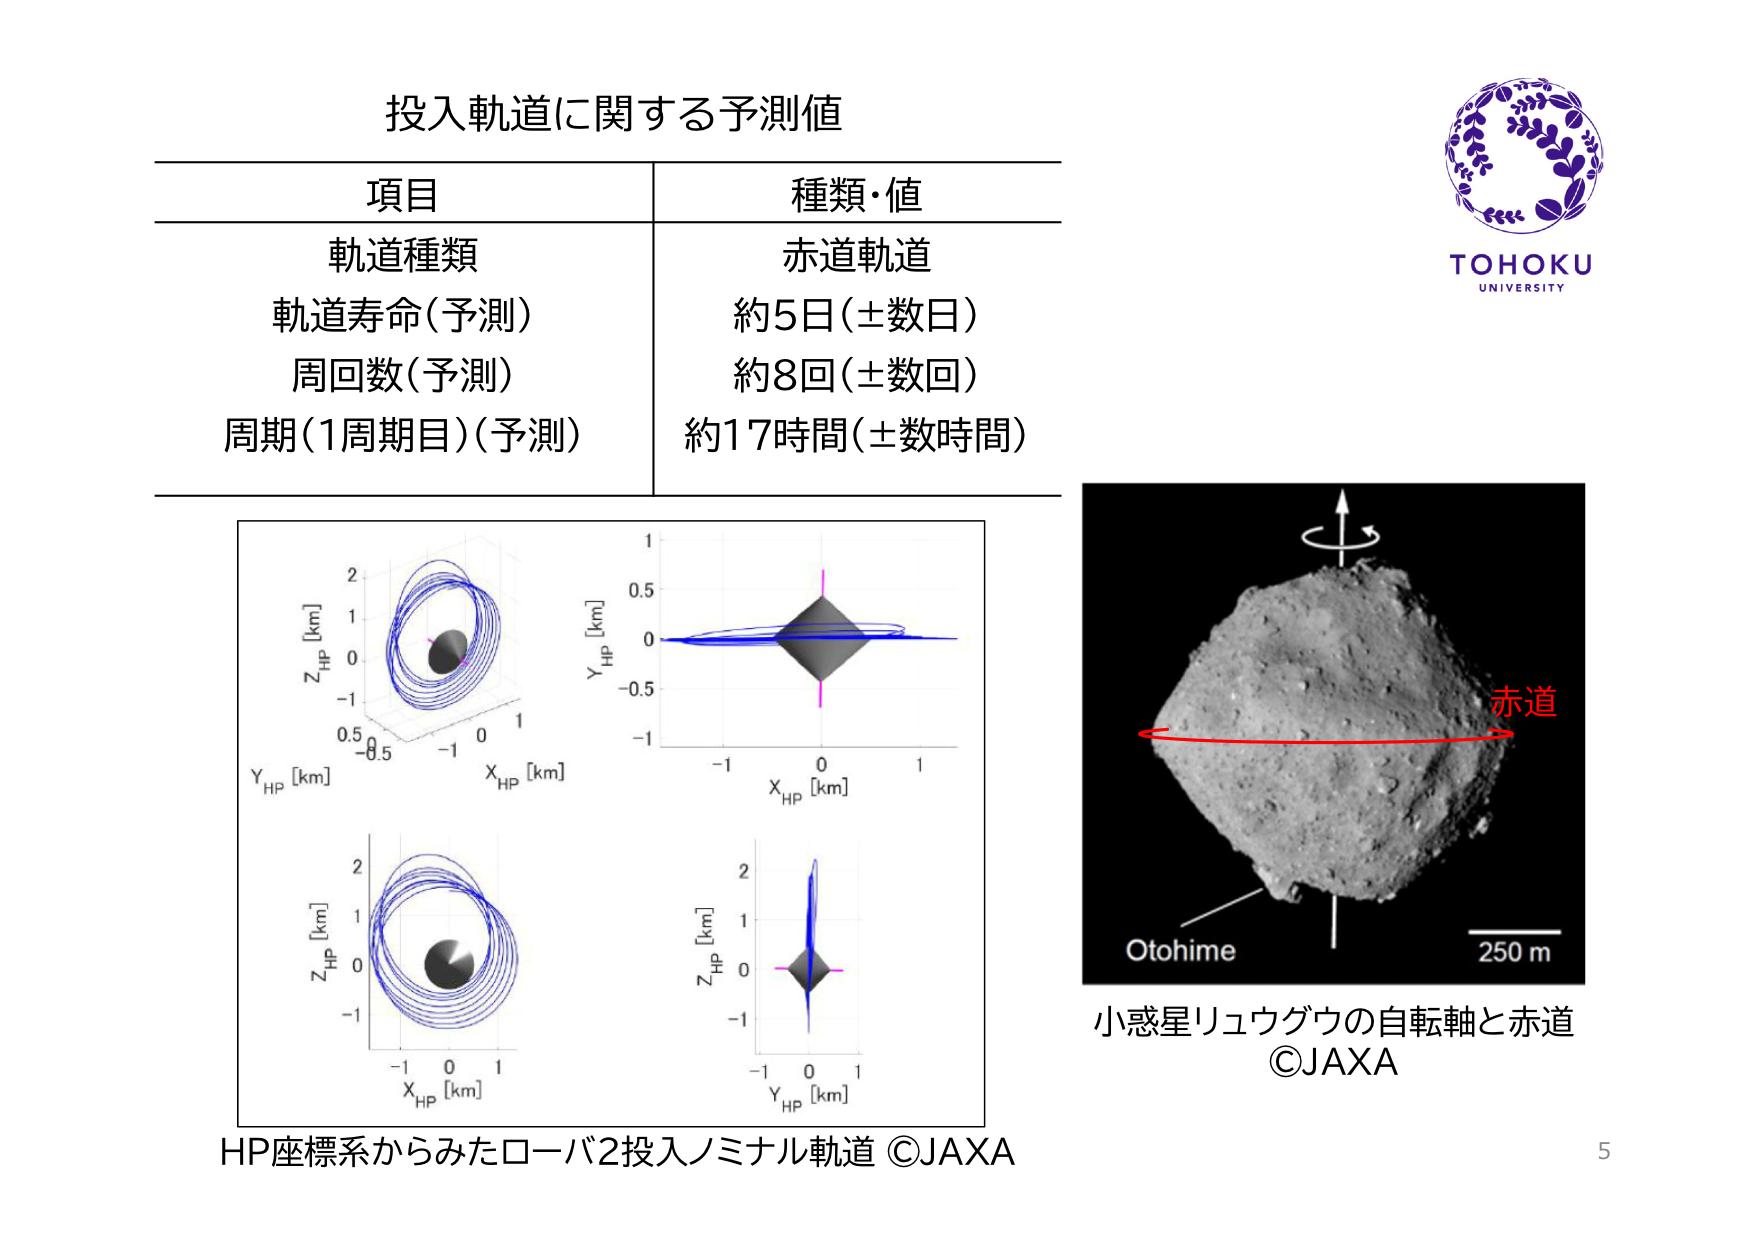 f:id:Imamura:20190924122704p:plain